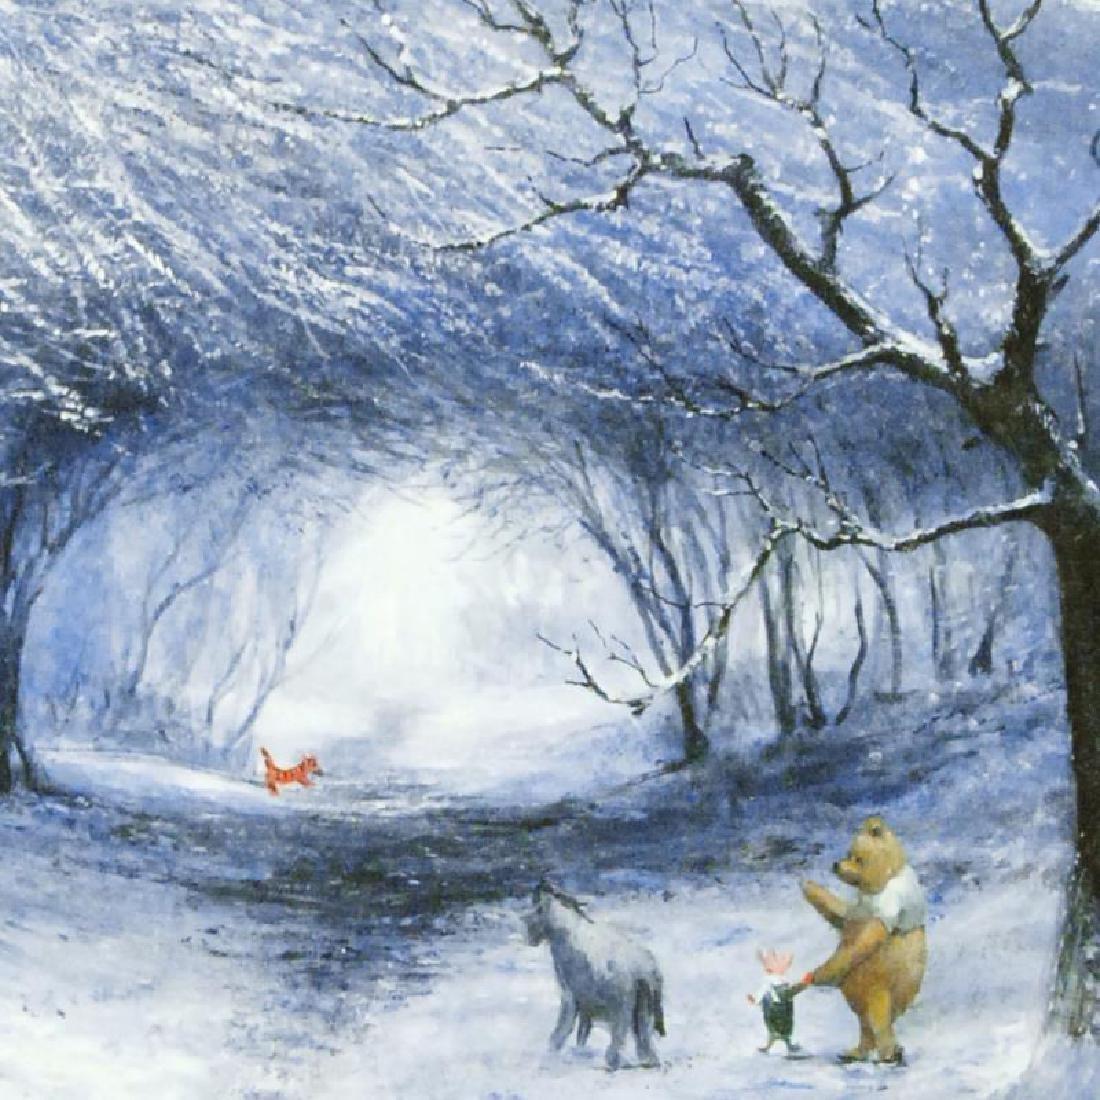 Winter Walk by Ellenshaw (1913-2007) - 2